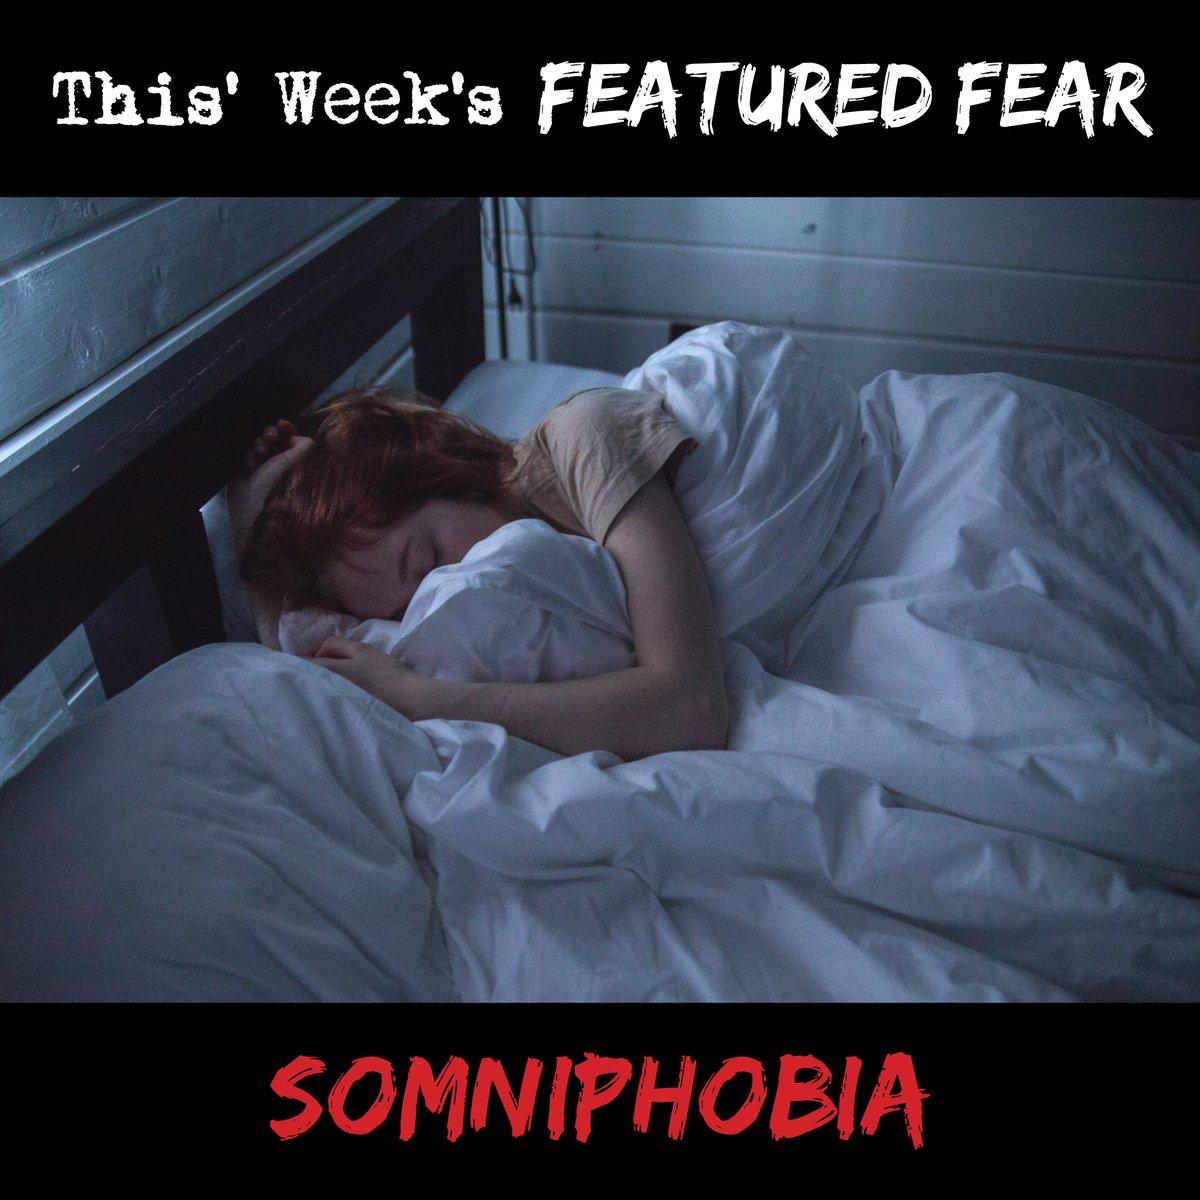 Somniphobia Hashtag On Twitter